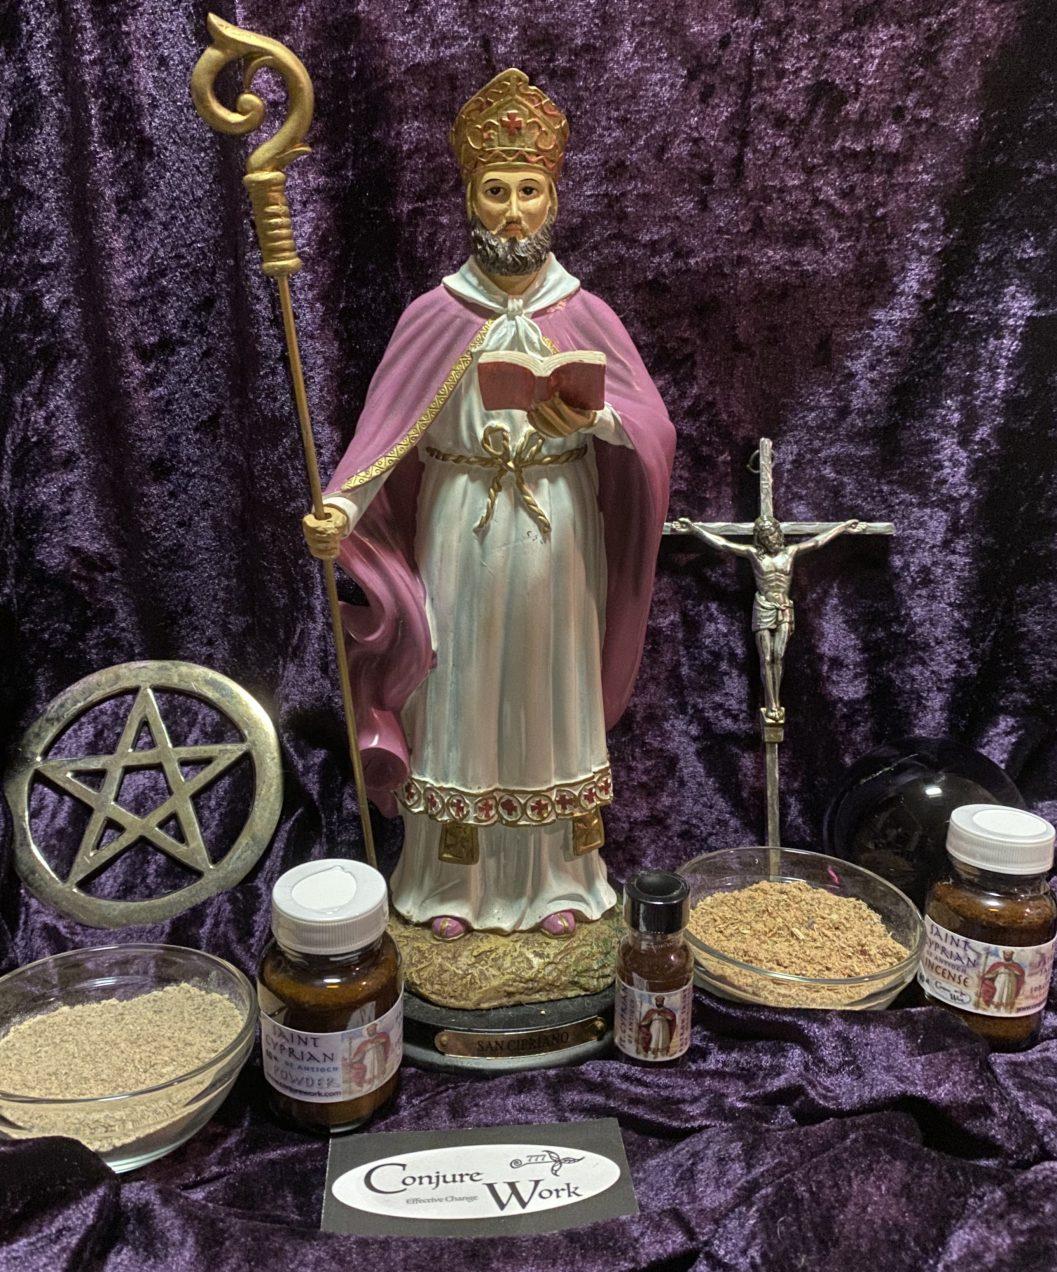 Saint Cyprian of Antioch, oil, powder, incense, Conjure Work, sorcery supplies